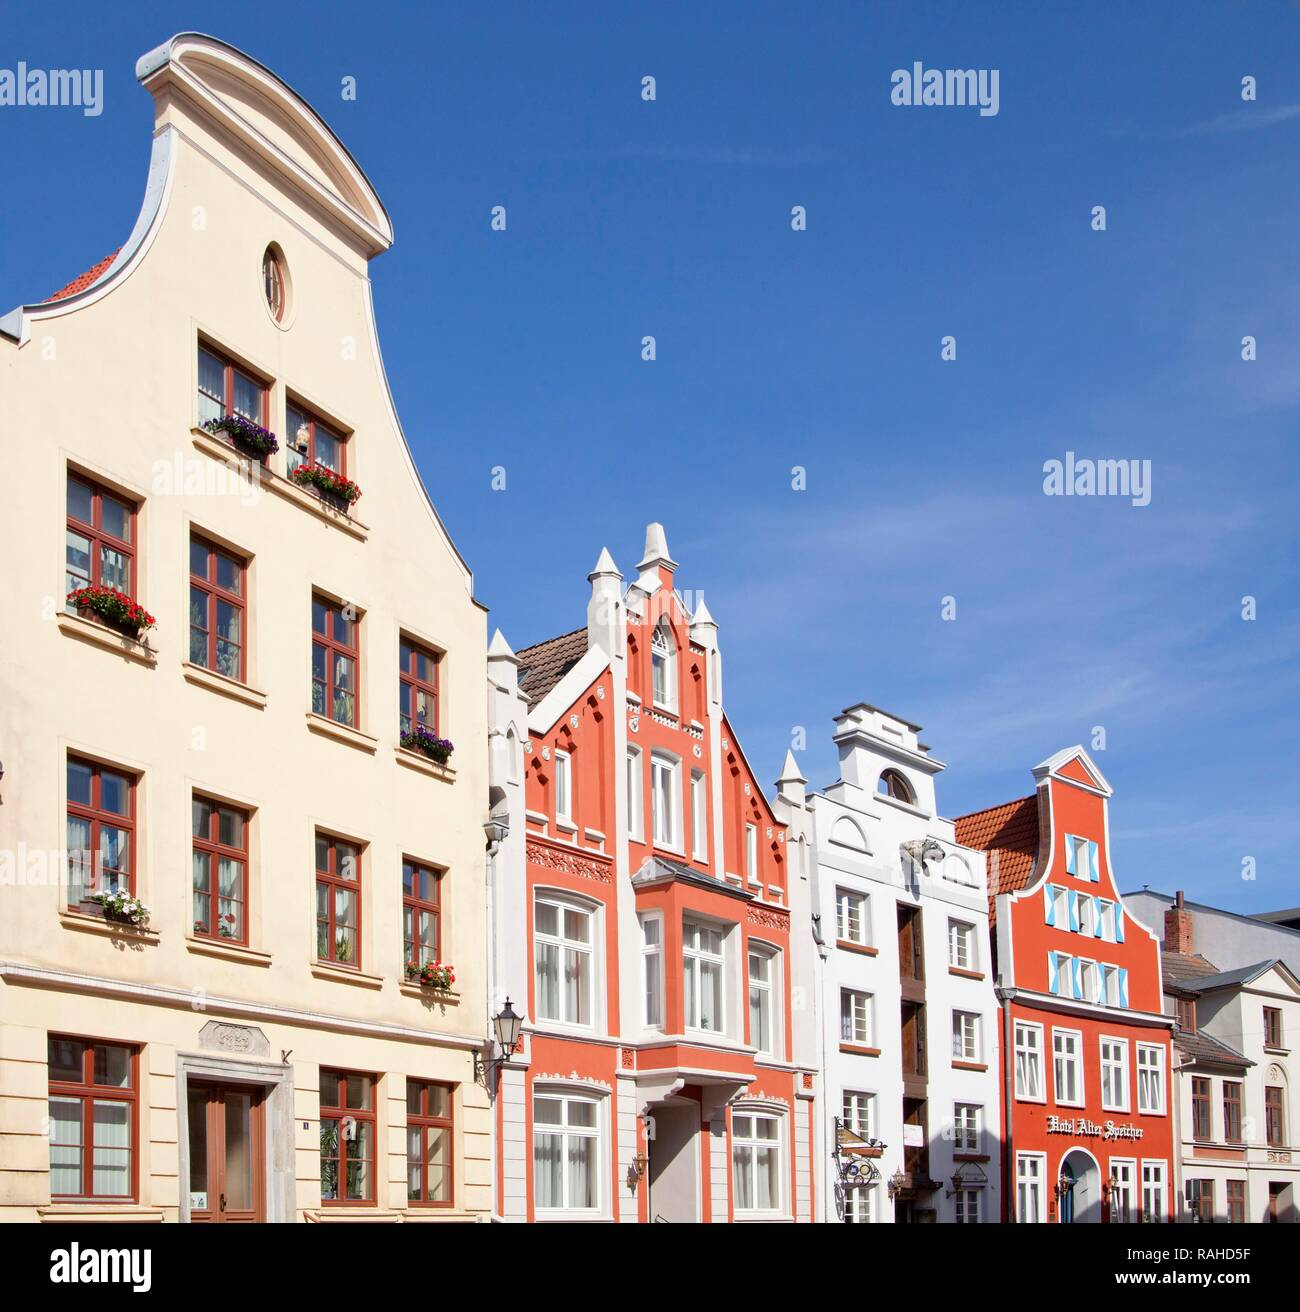 Storehouses, Rohrstrasse street, Wismar, Mecklenburg-Western Pomerania - Stock Image